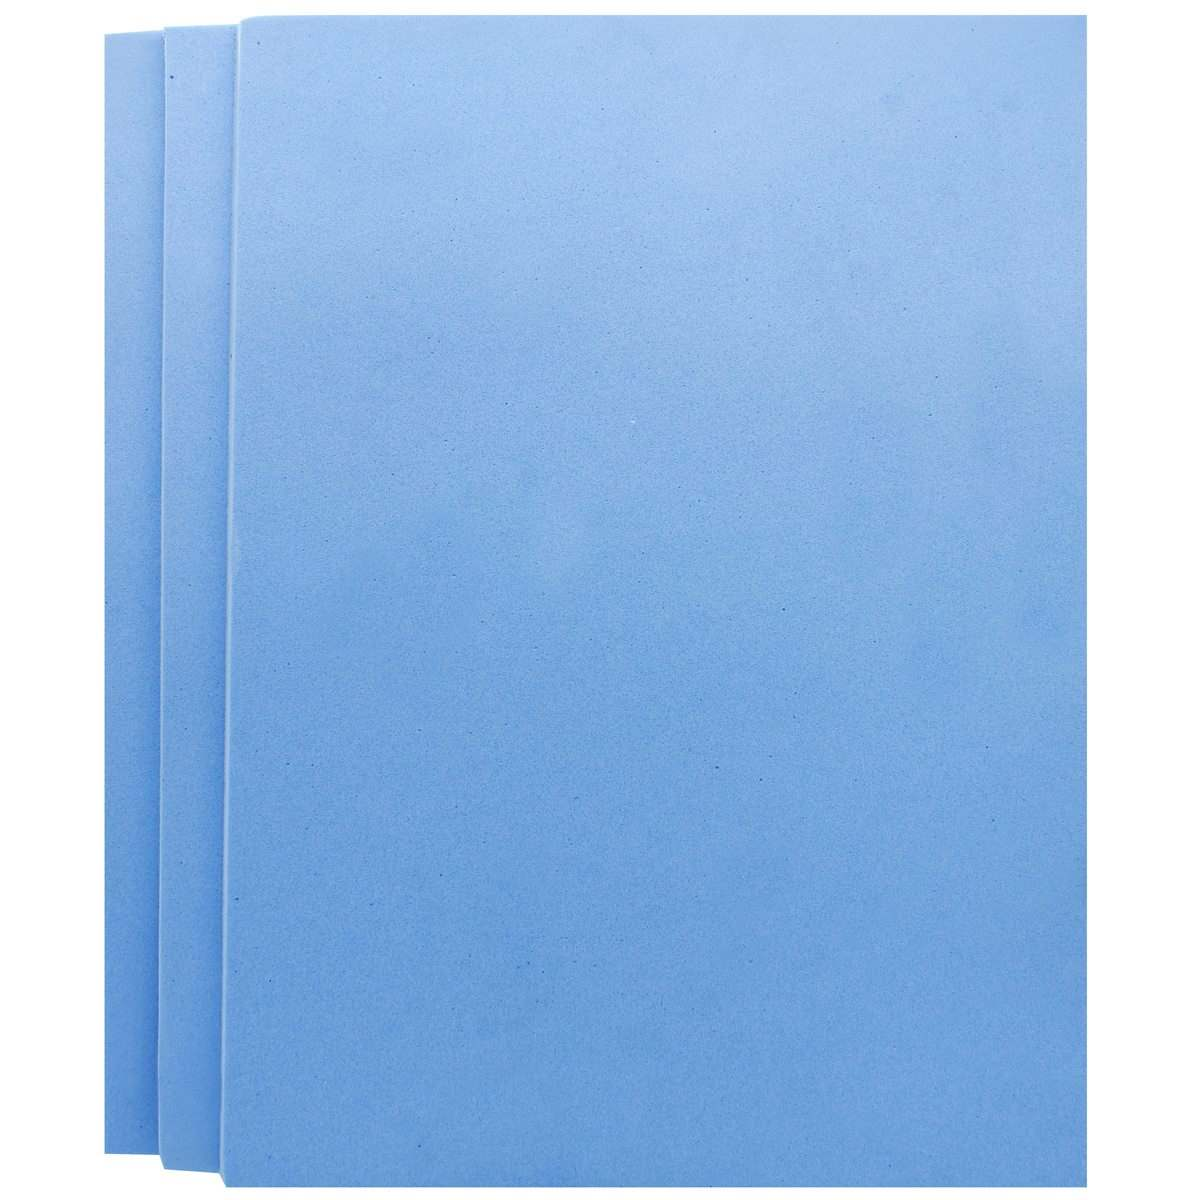 Foam Sheets A4 Size Without Sticker 3MM Sky Blue